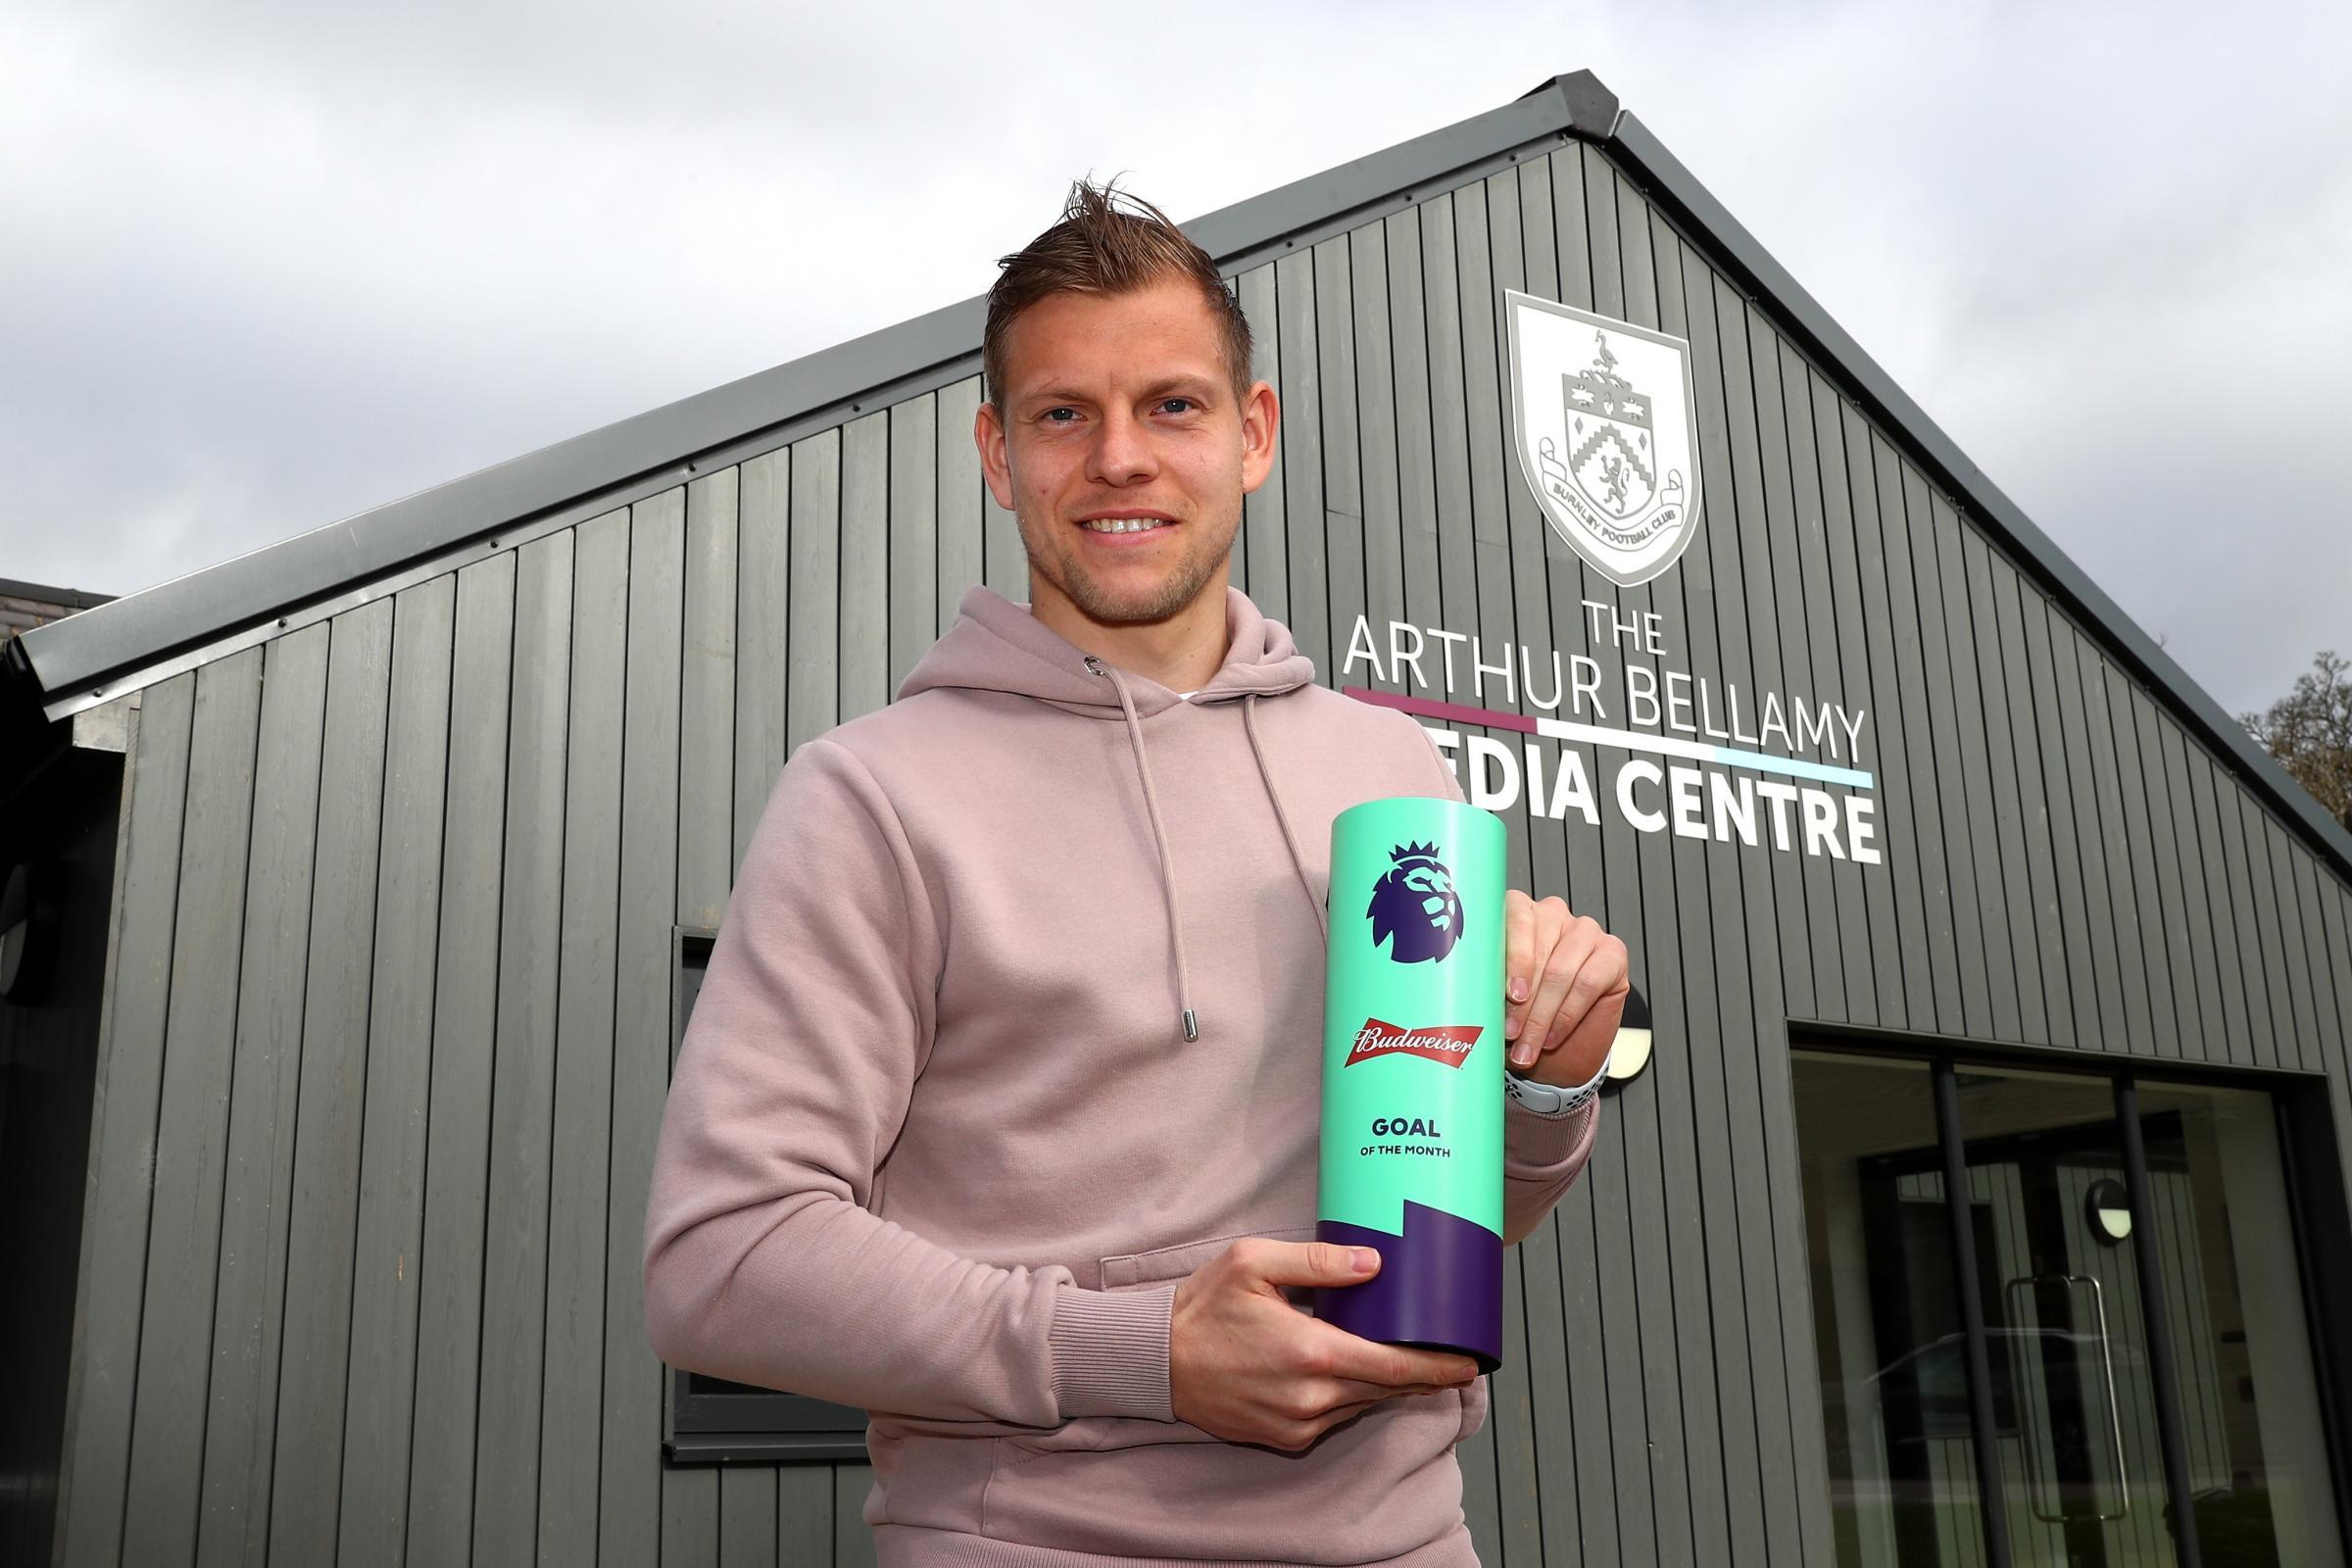 Matej Vydra strike at Southampton wins goal of the month